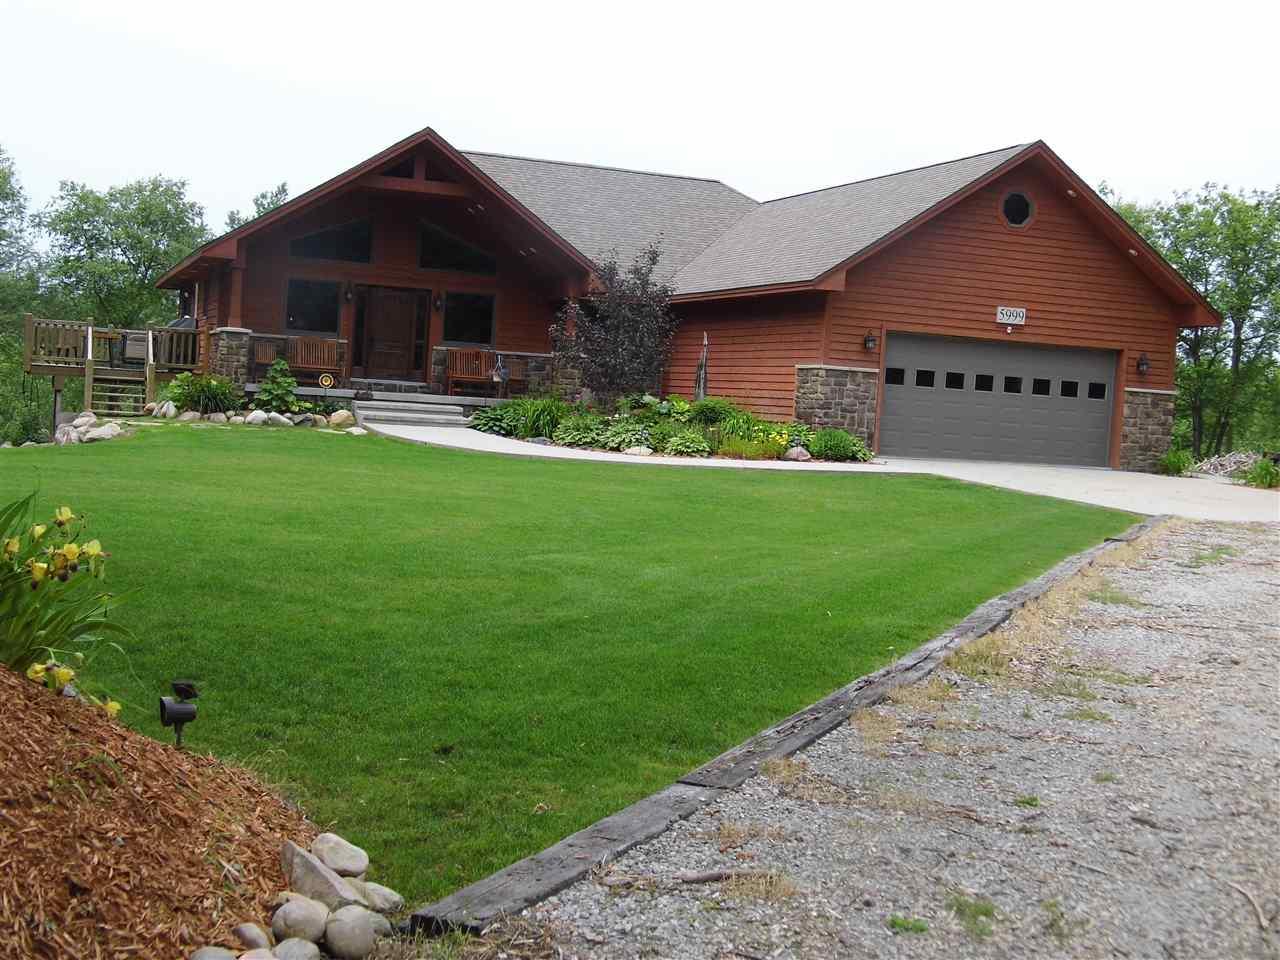 Real Estate for Sale, ListingId: 34075166, Roscommon,MI48653